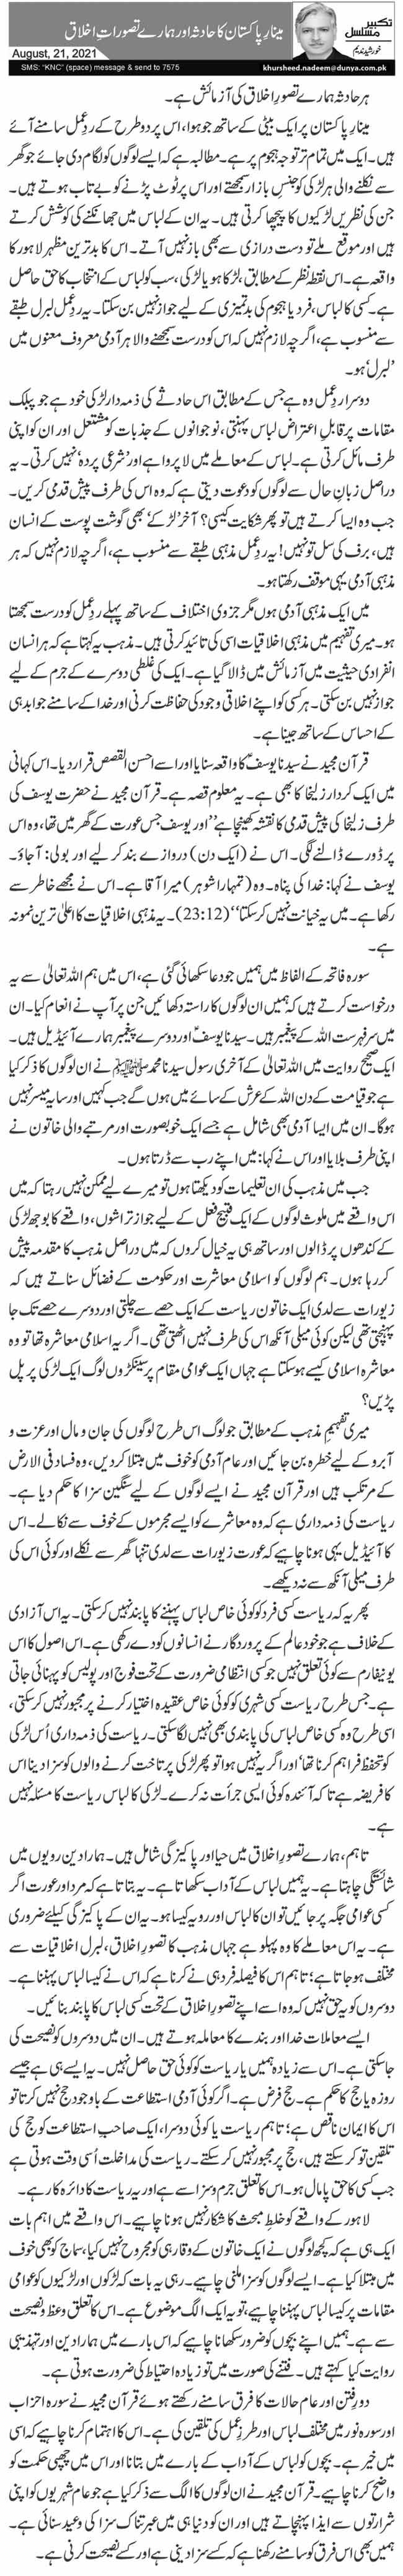 مینارِ پاکستان کا حادثہ اور ہمارے تصوراتِ اخلاق